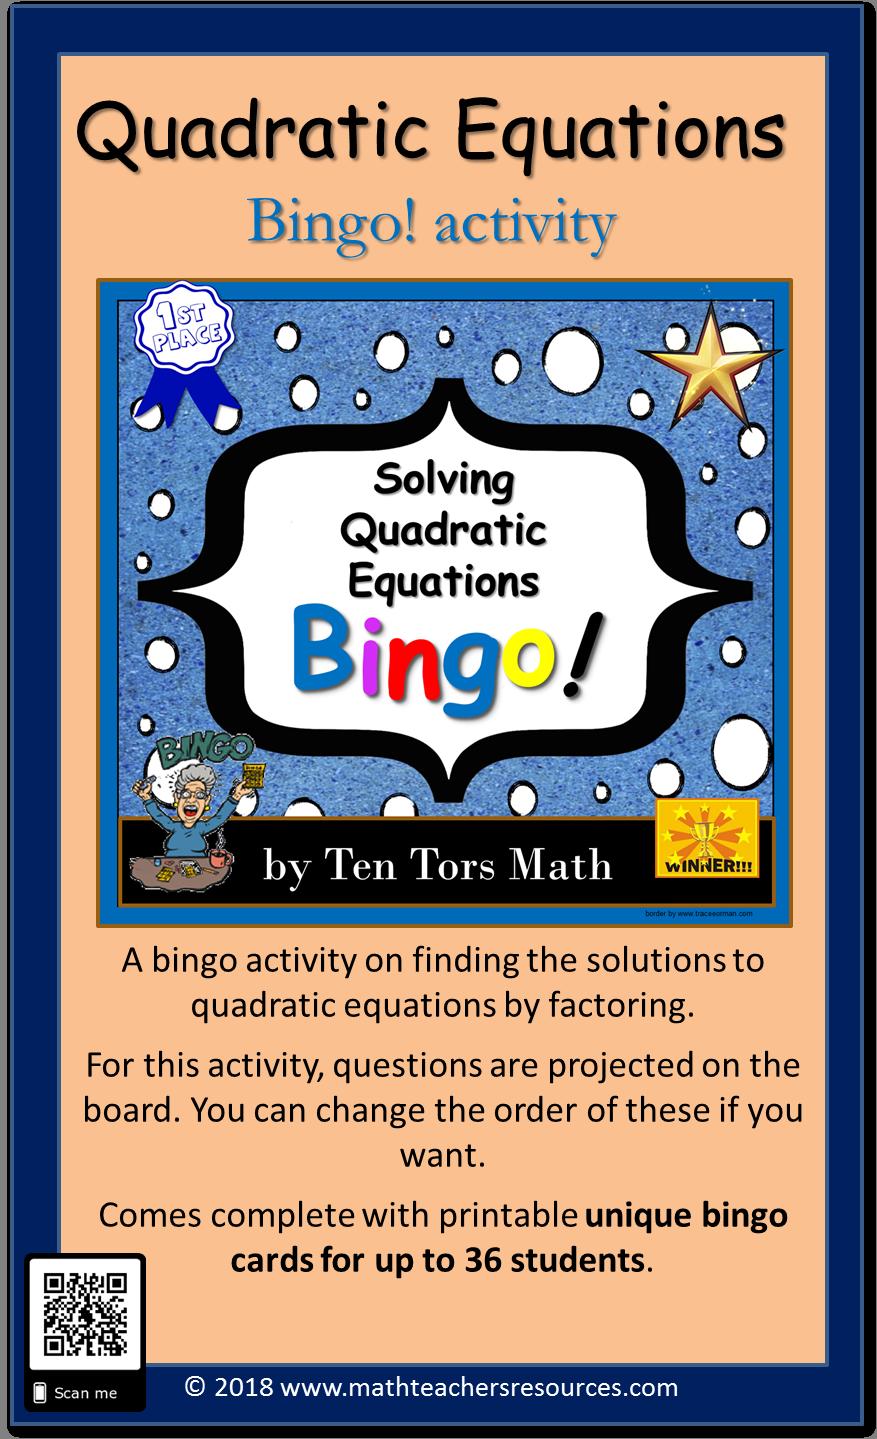 Solving Quadratic Equations Bingo Game A Bingo Activity On Finding The Solutions To Quadratic Equa Combining Like Terms Solving Quadratic Equations Quadratics [ 1439 x 877 Pixel ]